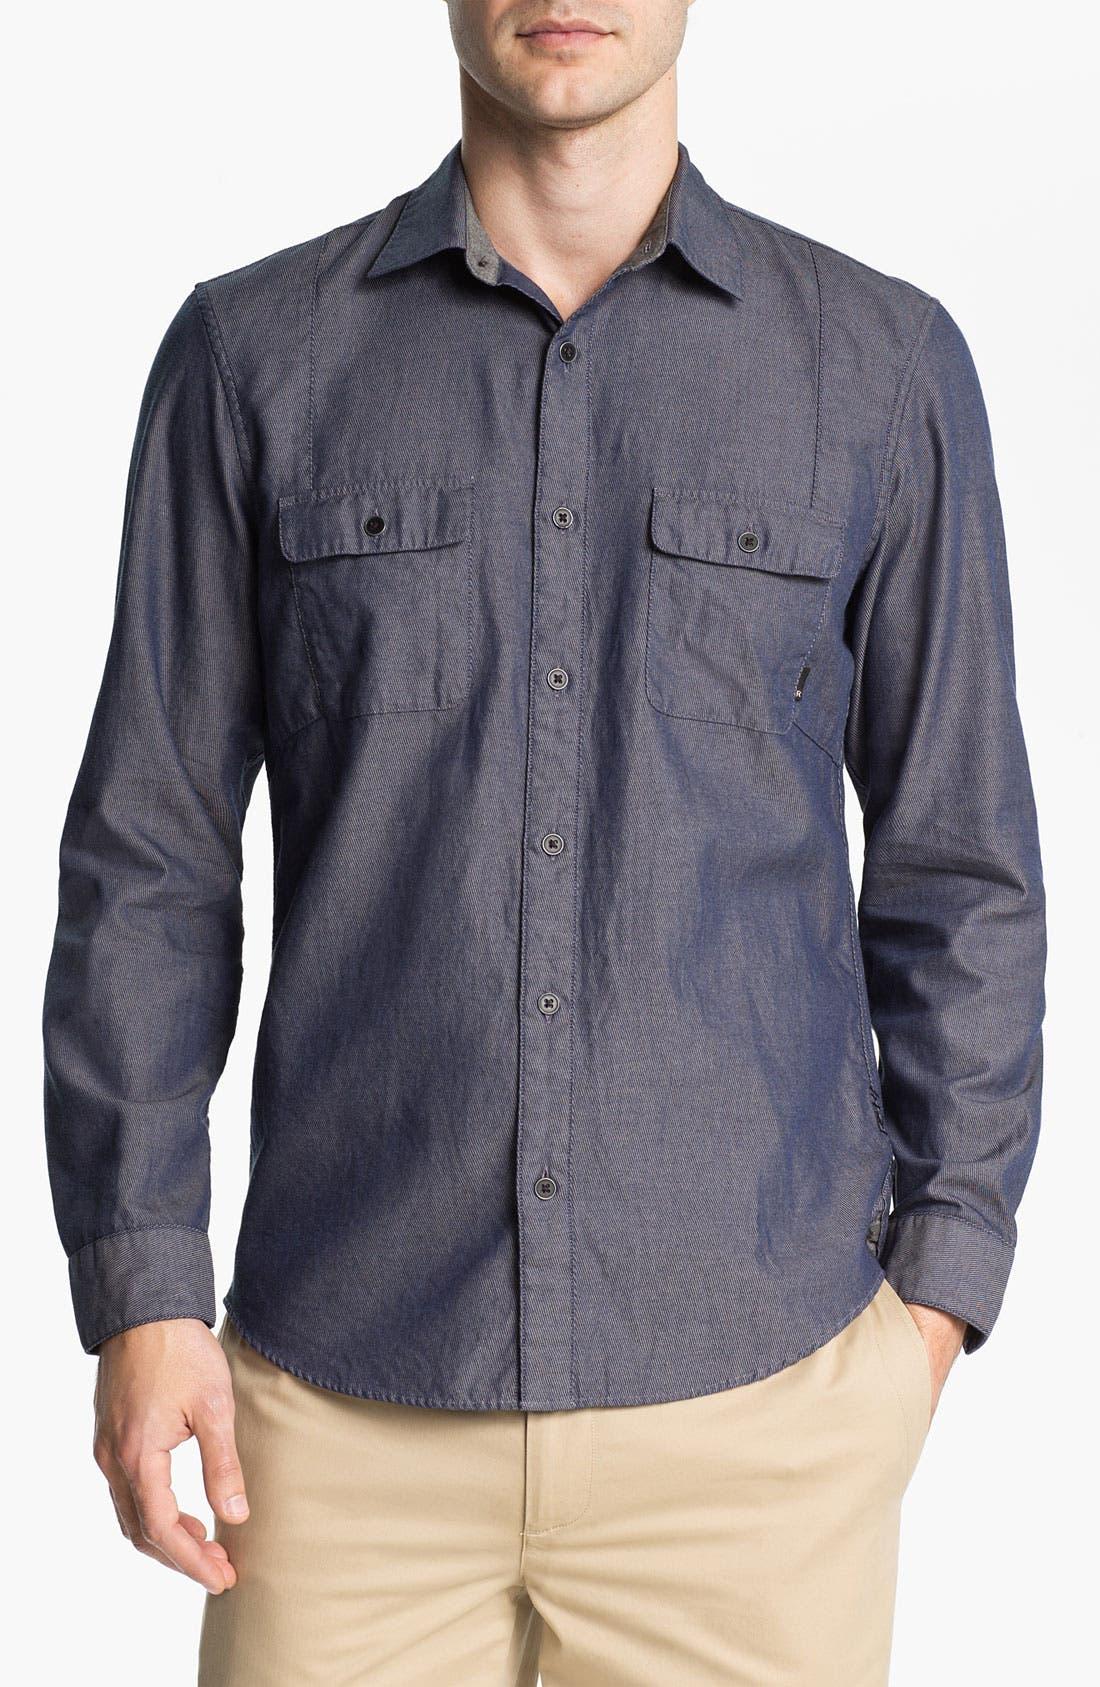 Alternate Image 1 Selected - R44 Rogan Standard Issue Twill Denim Shirt